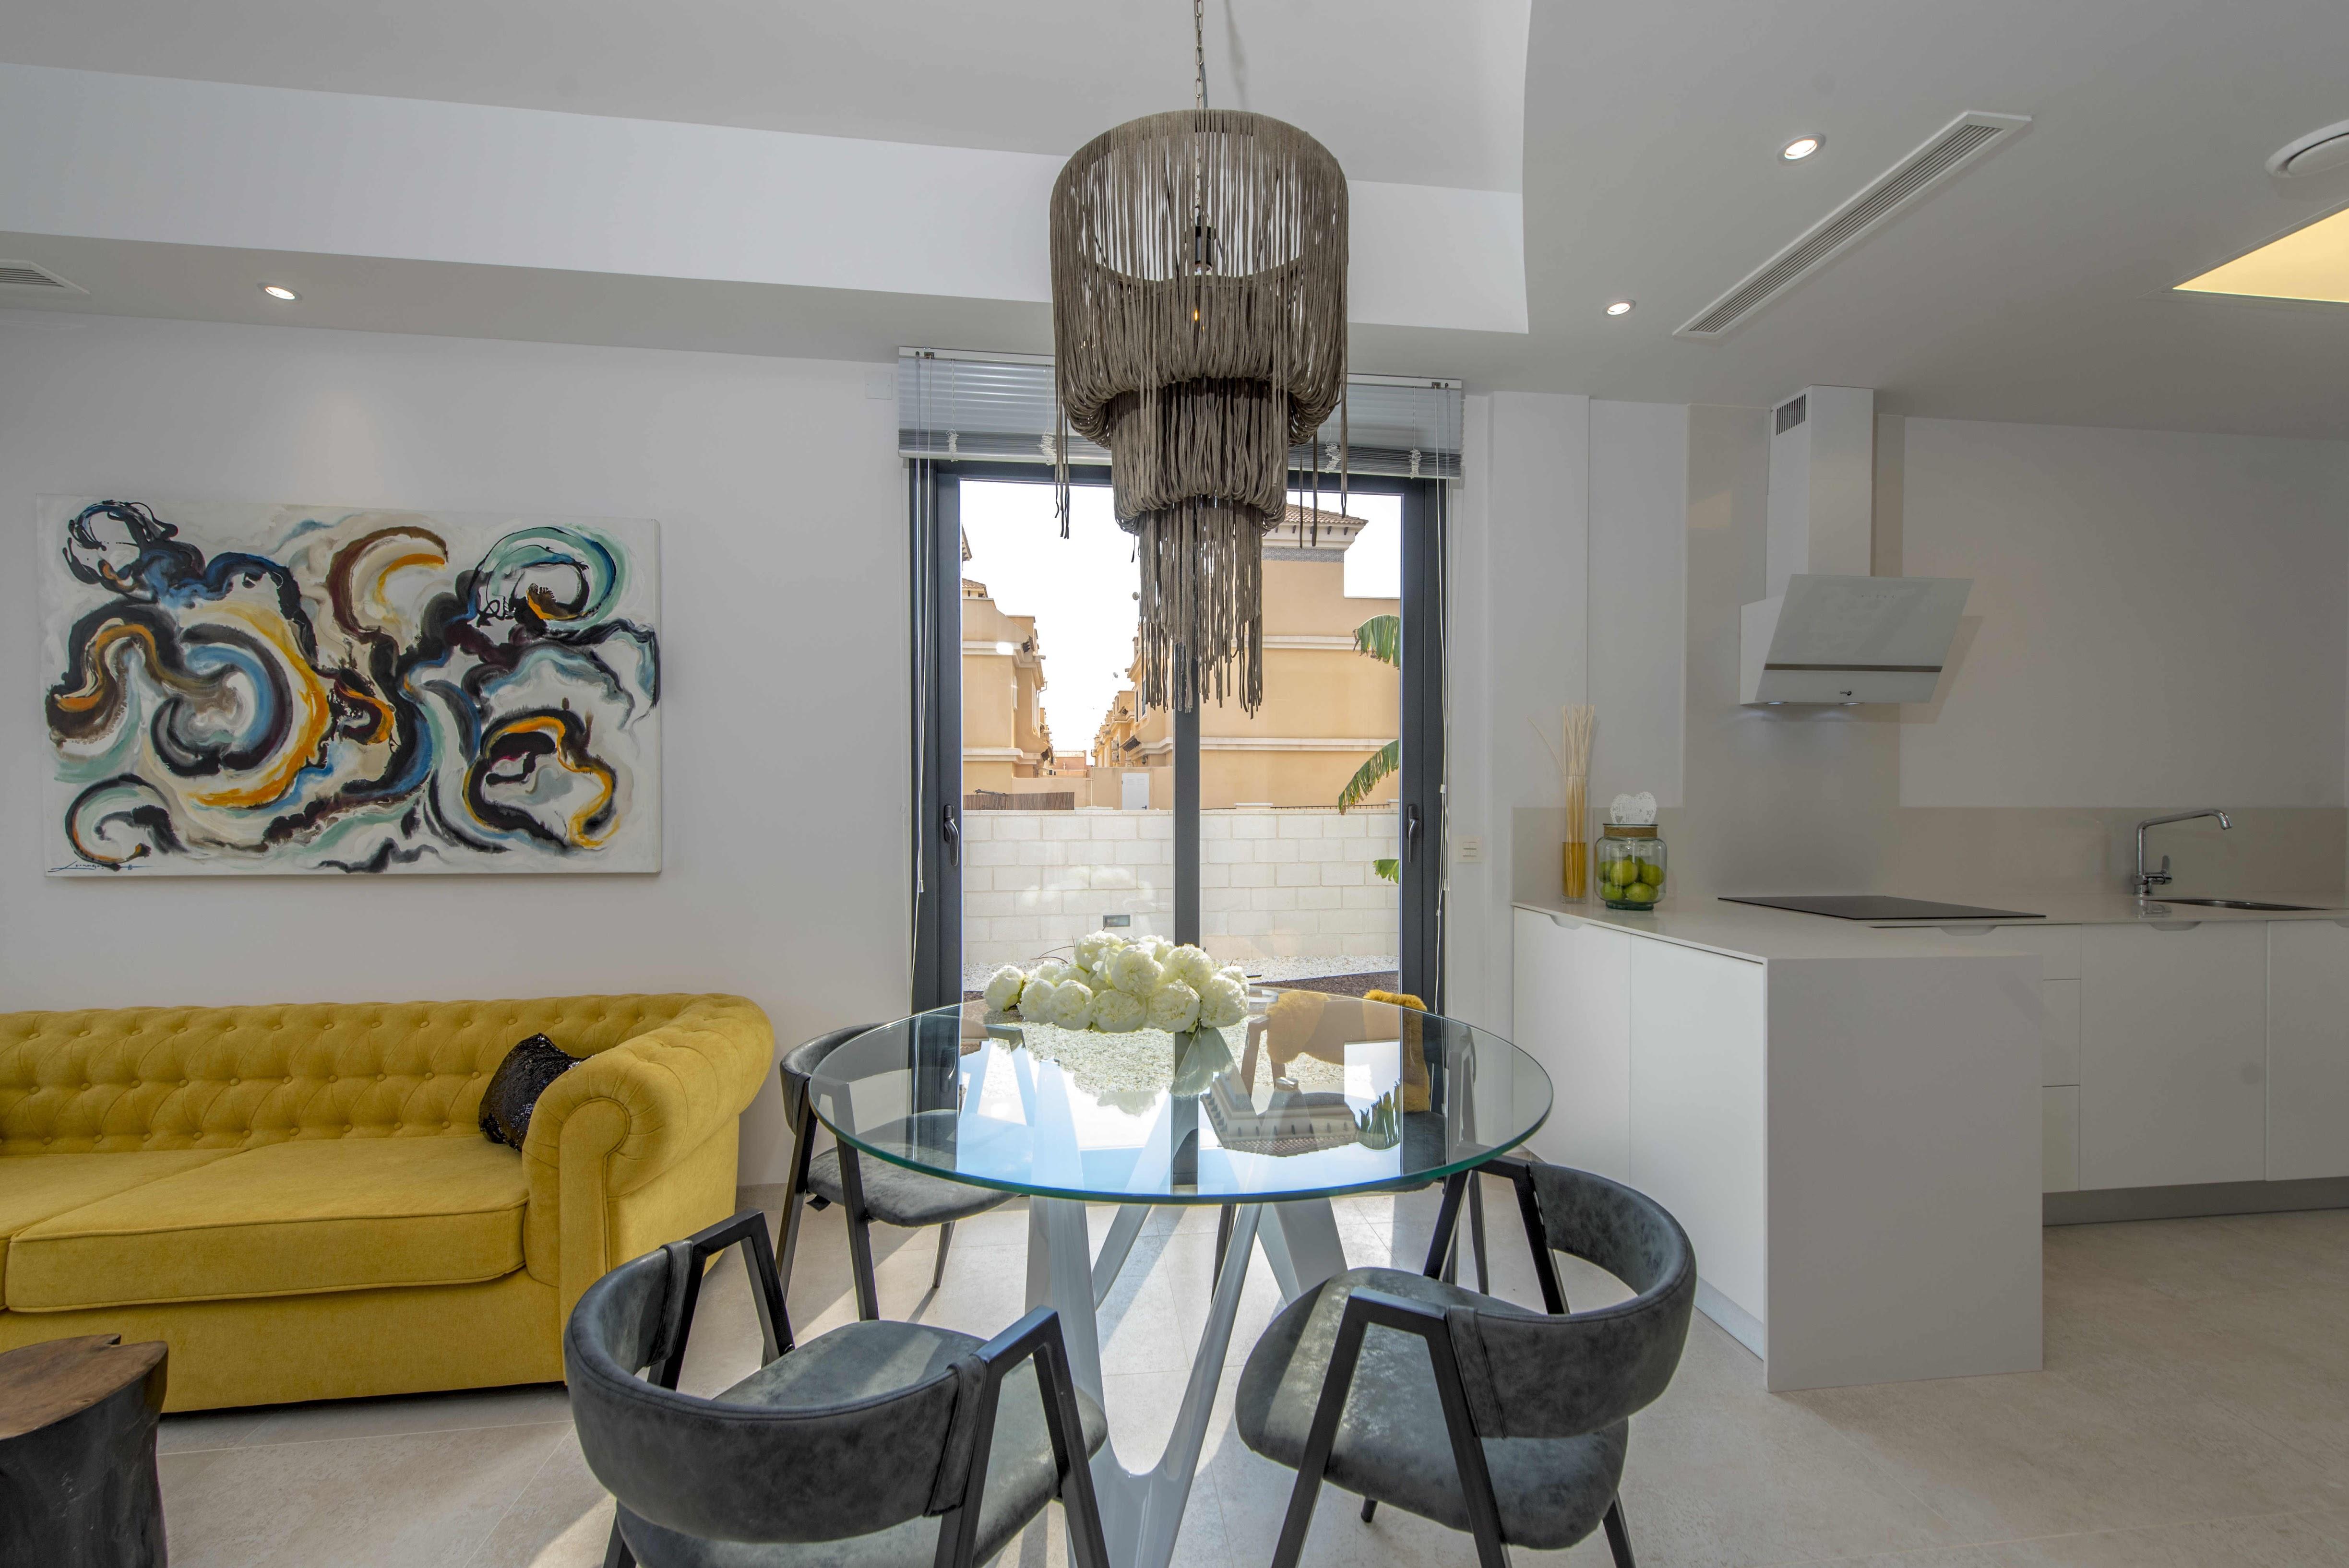 D Plex En Residencial Hestia Homes Orihuela Costa Europisol # Casa Hestia Muebles